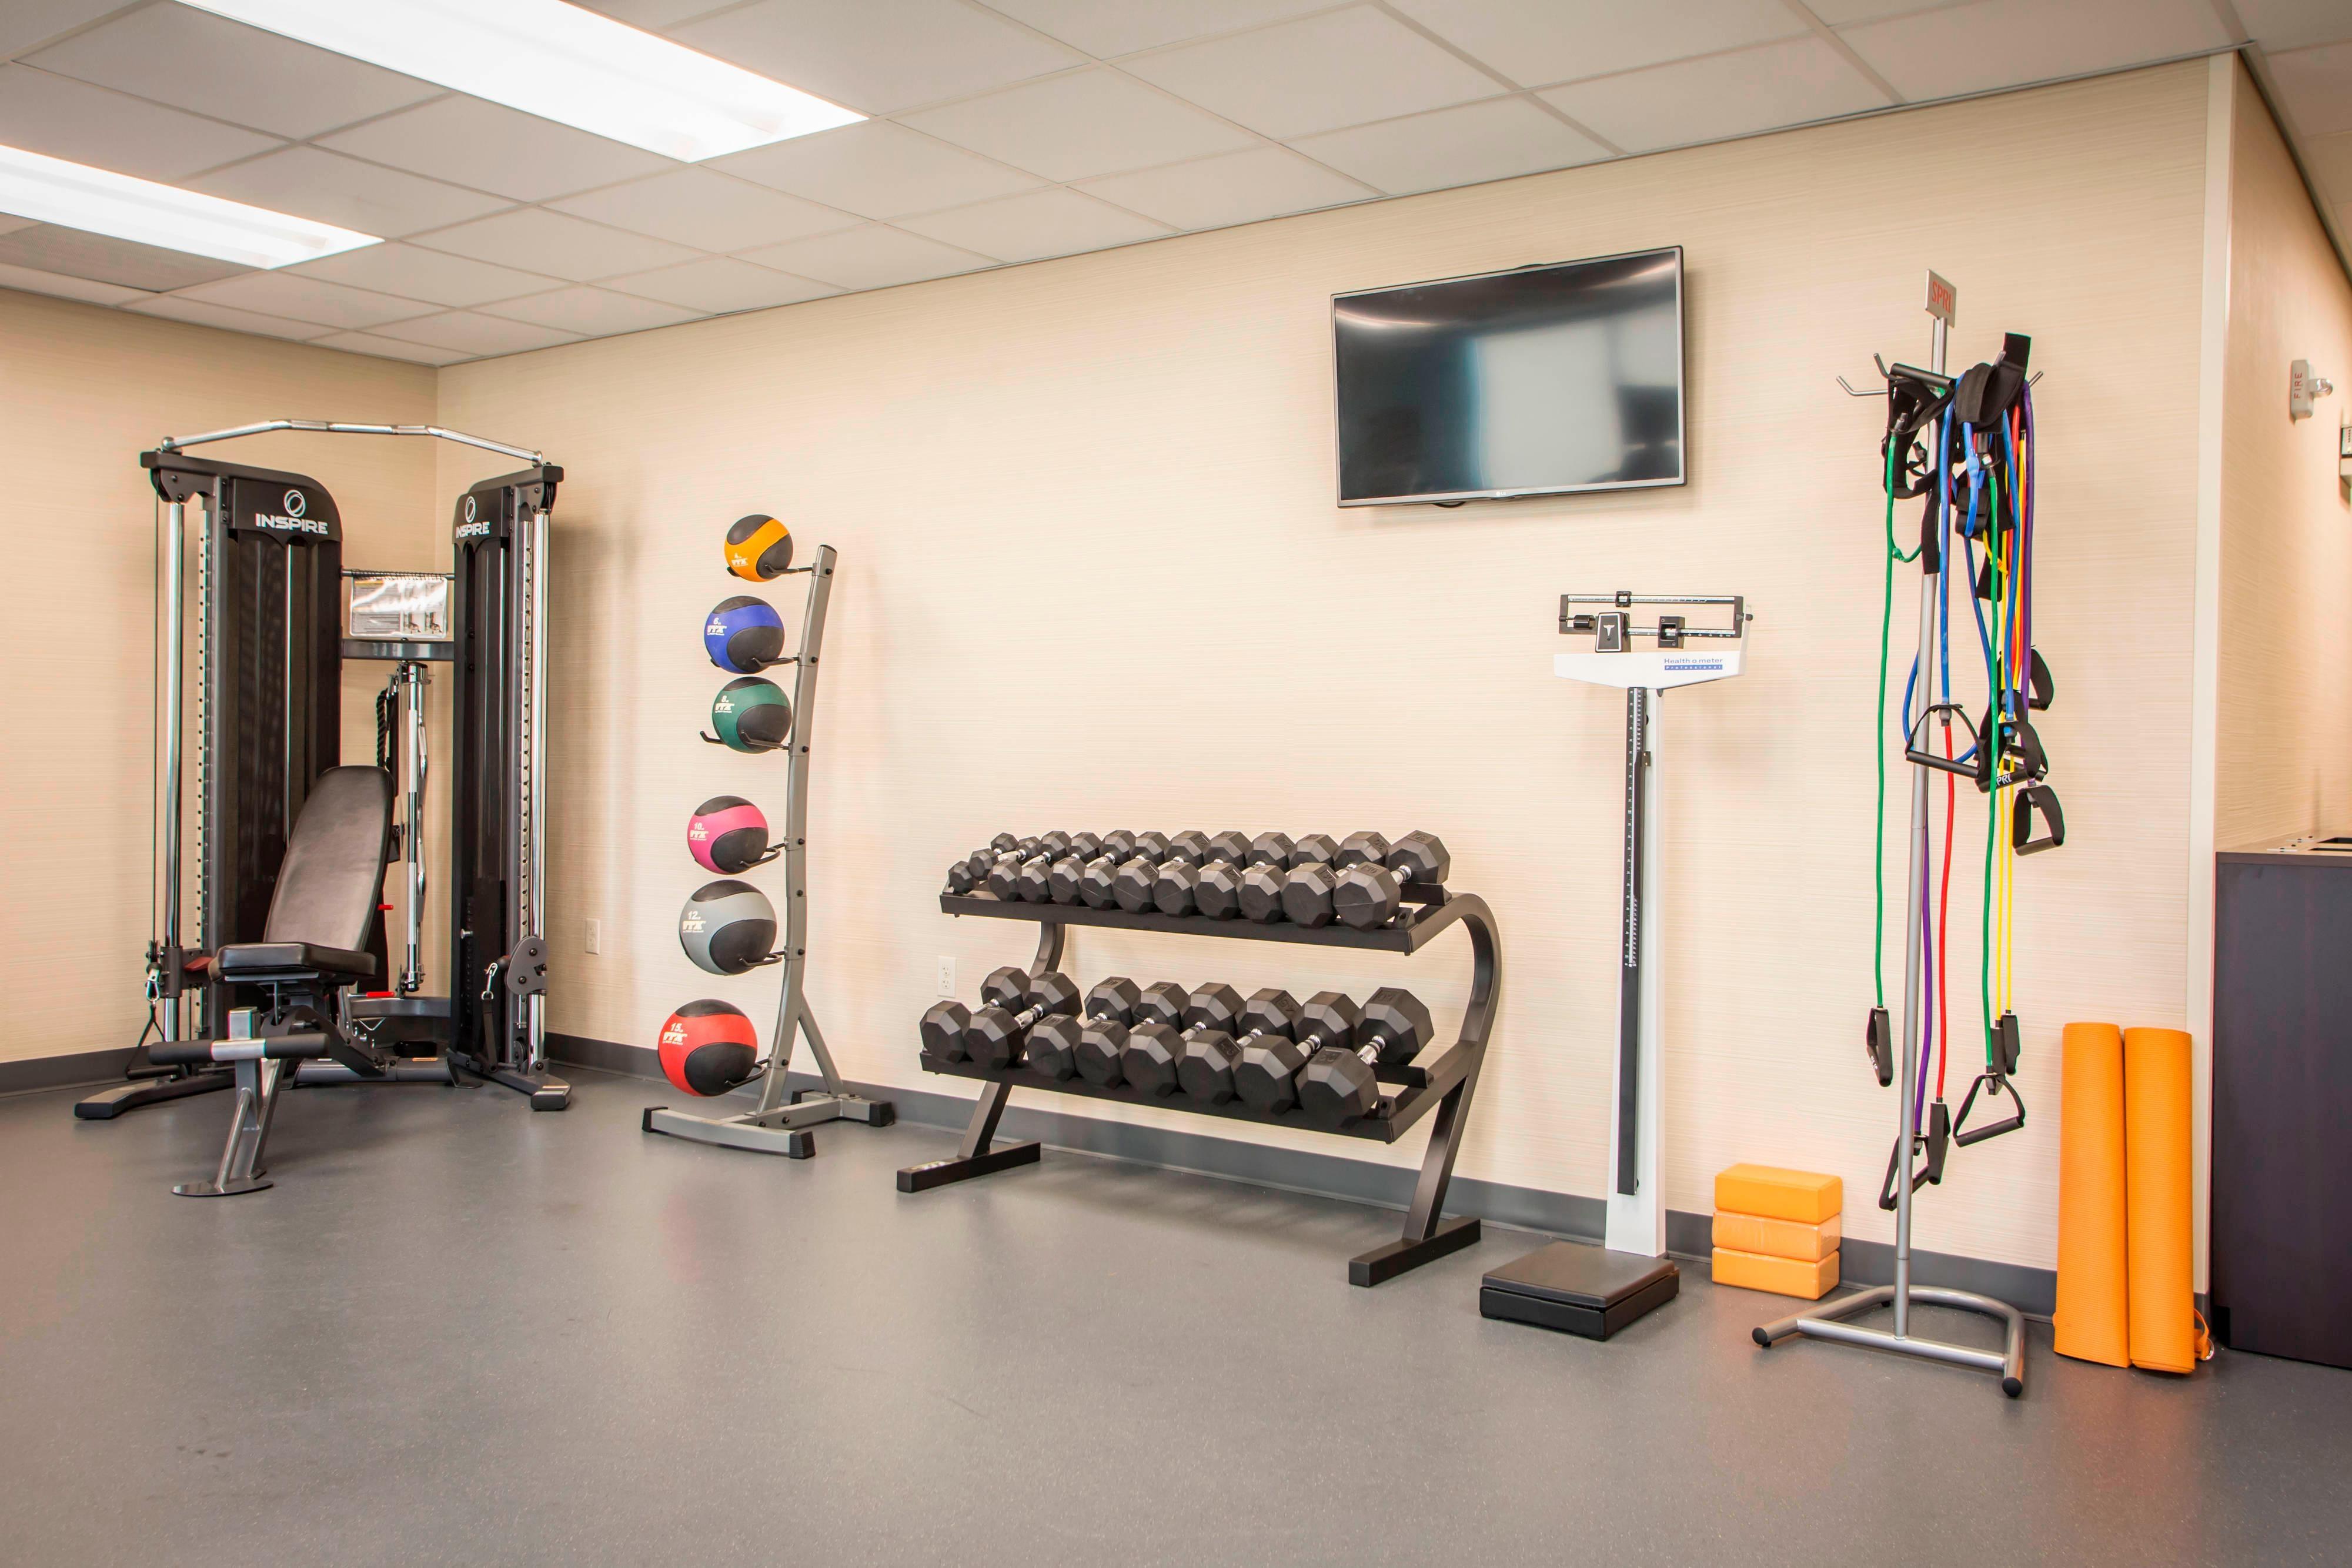 Fairfield Inn & Suites Fitness Center